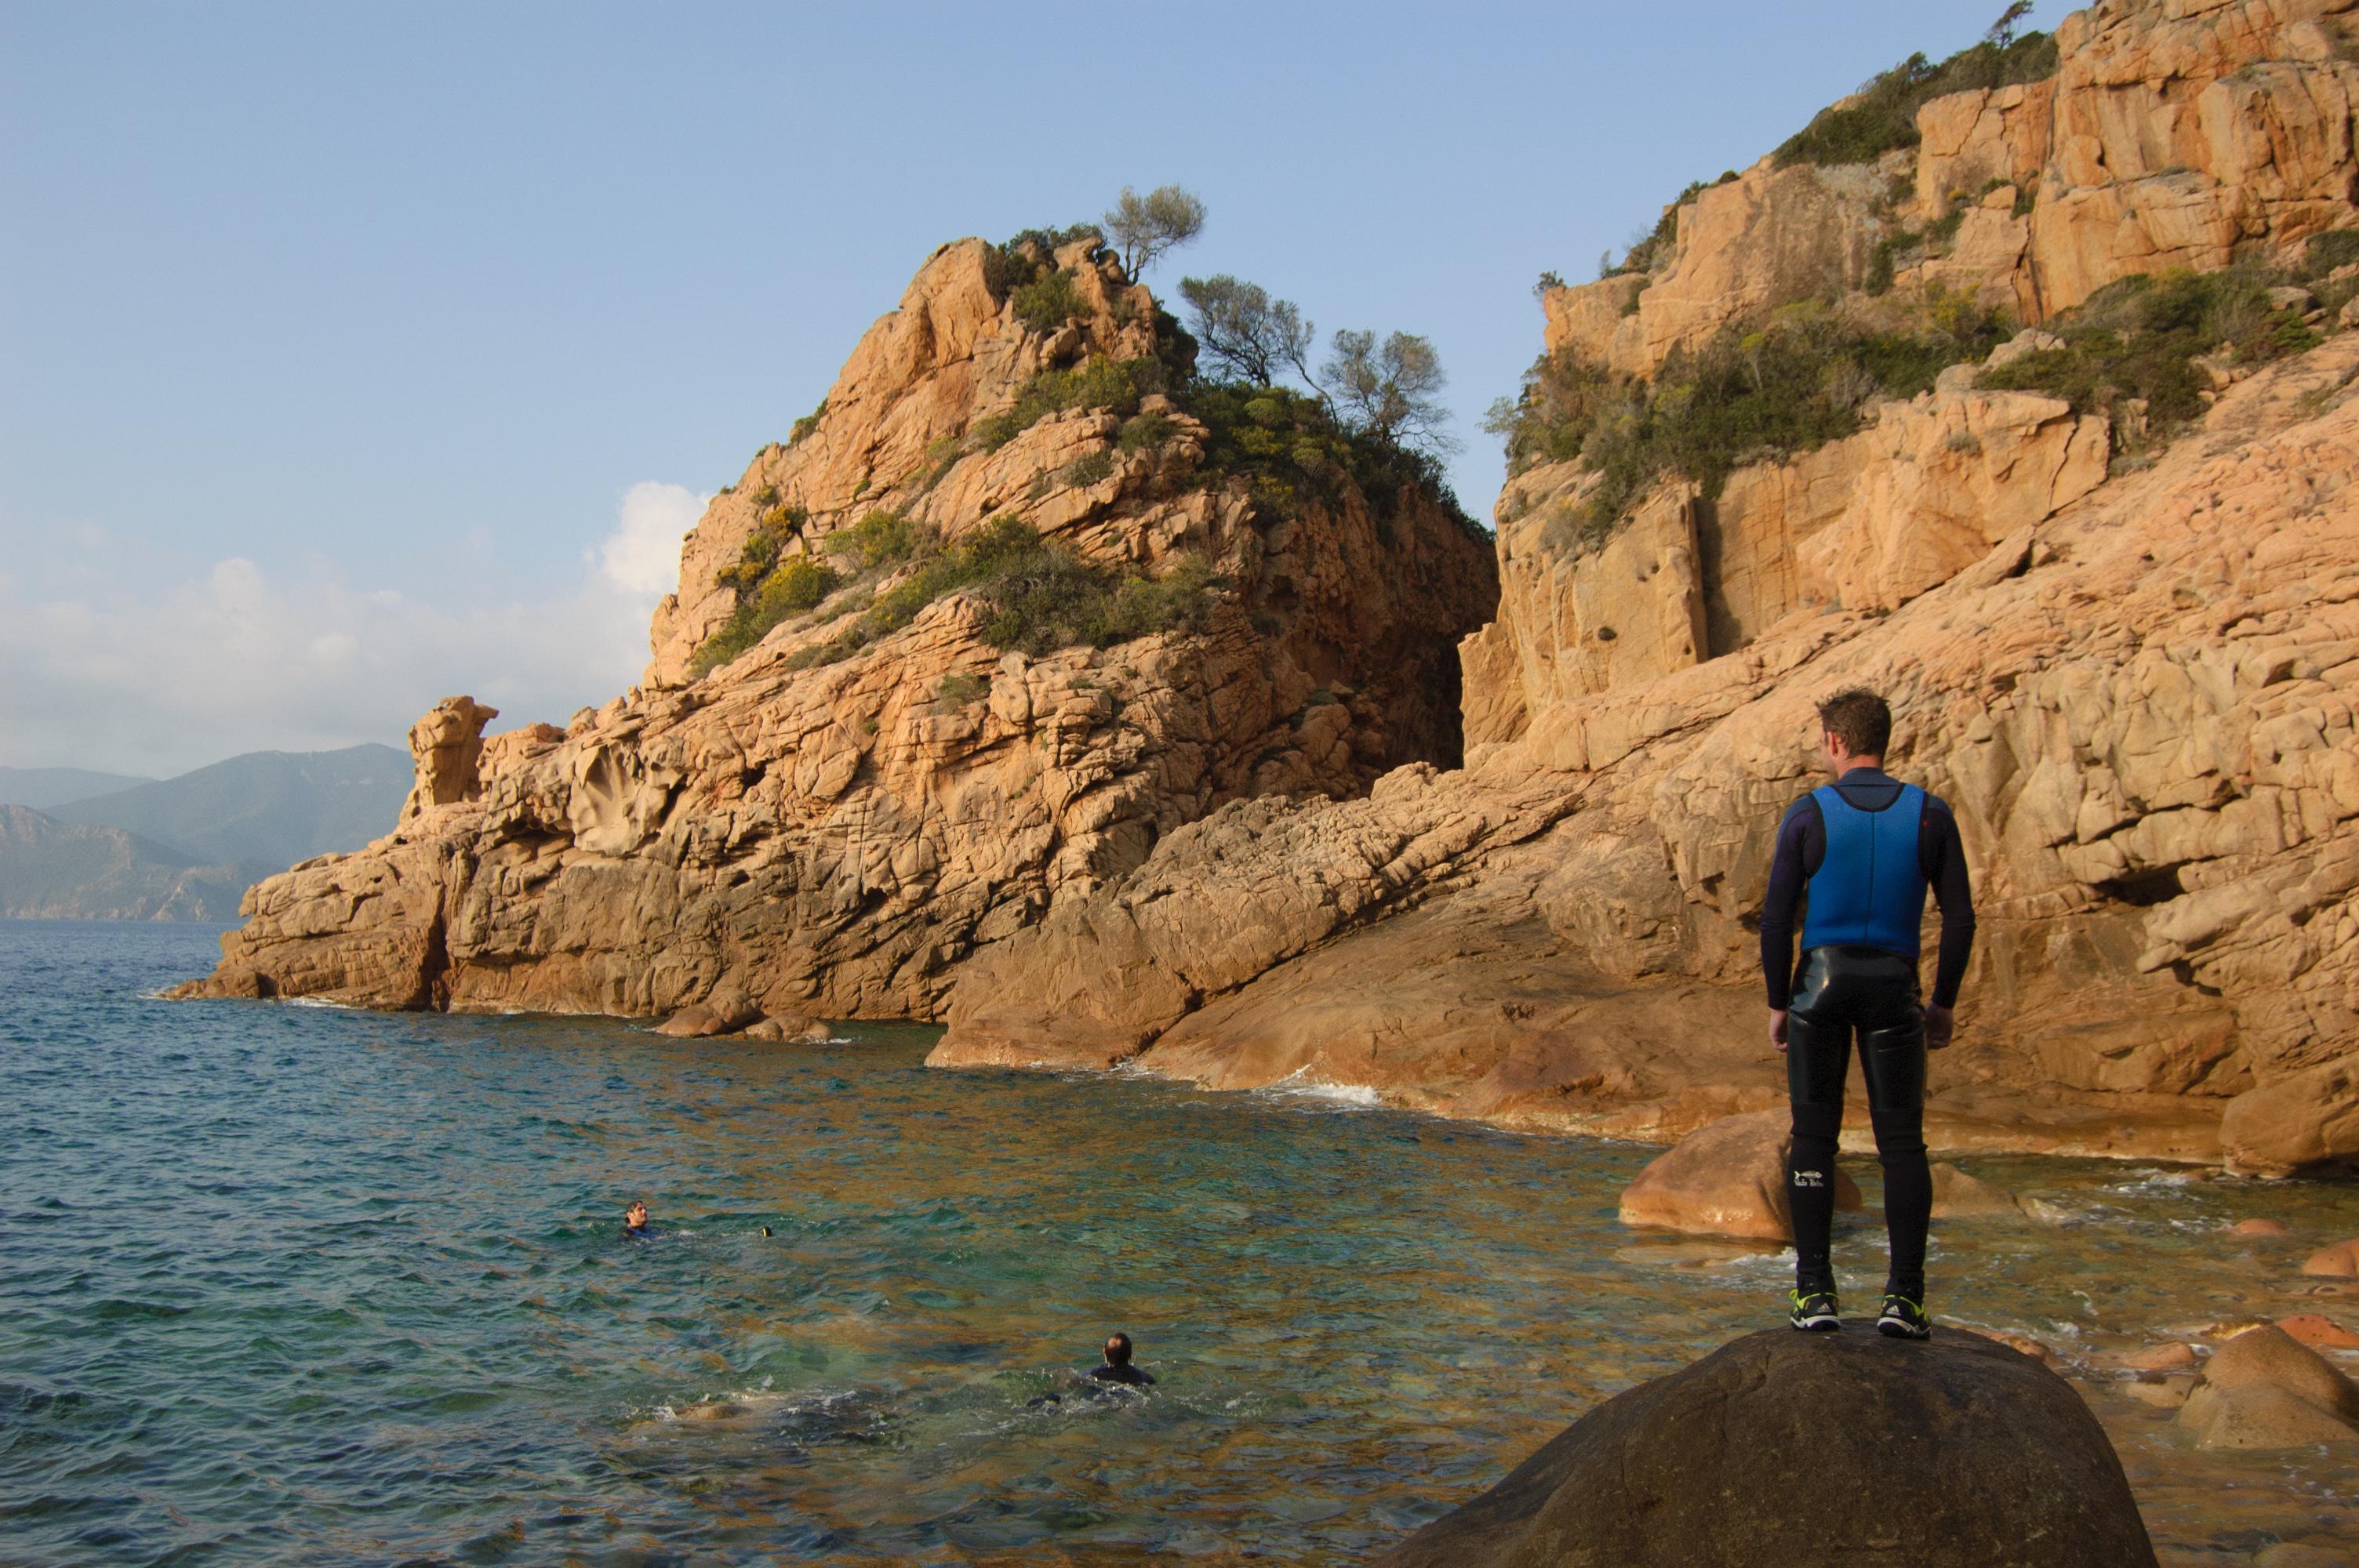 Sortie-en-mer-canyoning-Corse-Dardu